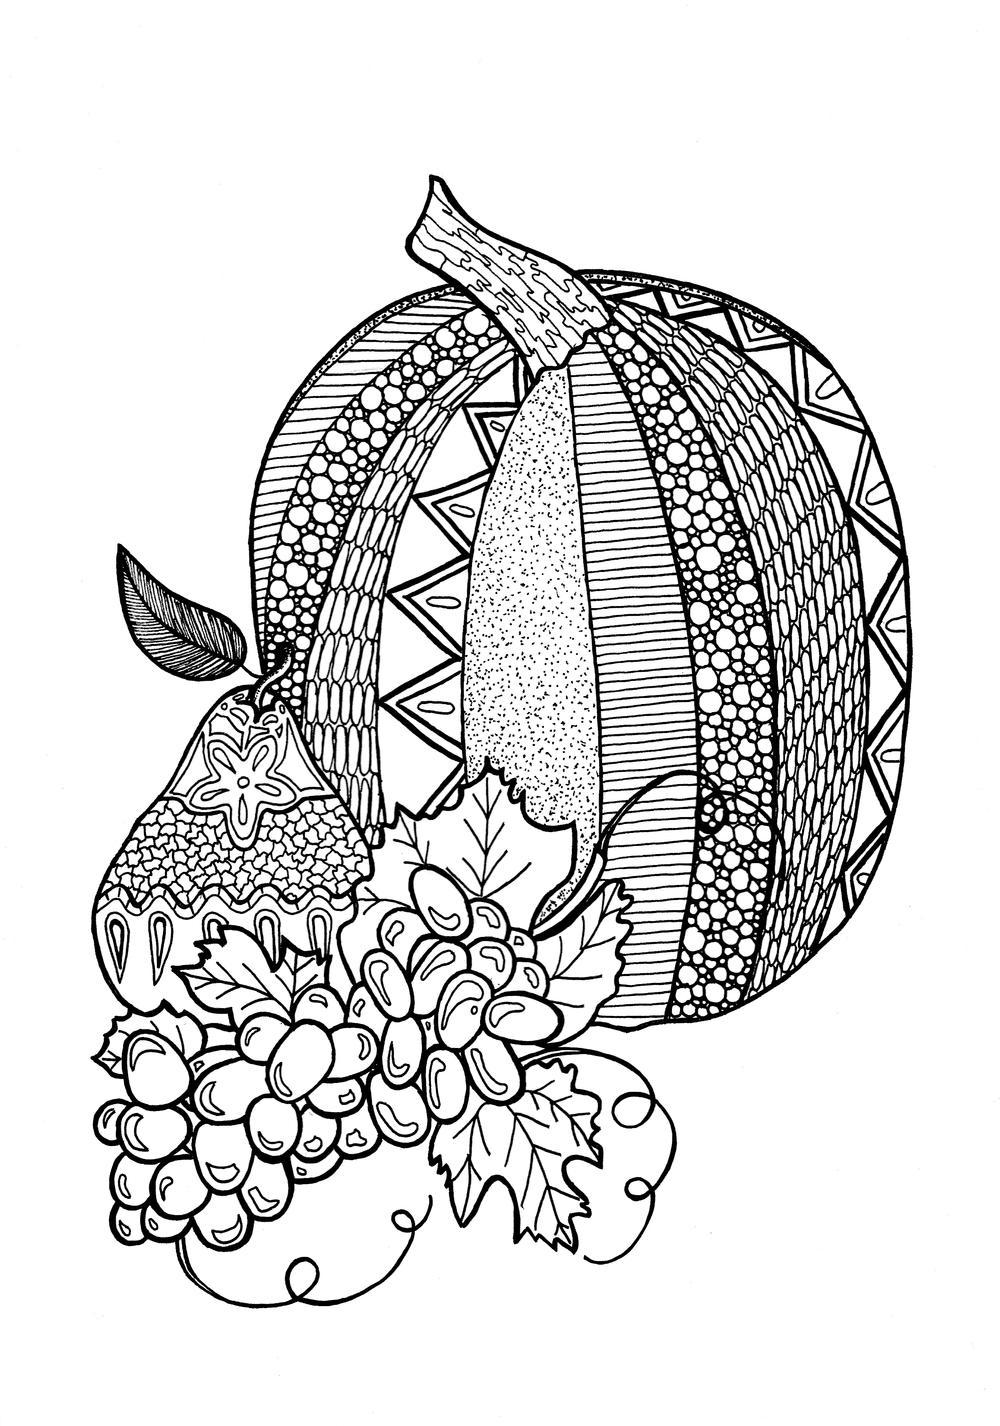 textured pumpkin coloring page allfreepapercrafts com